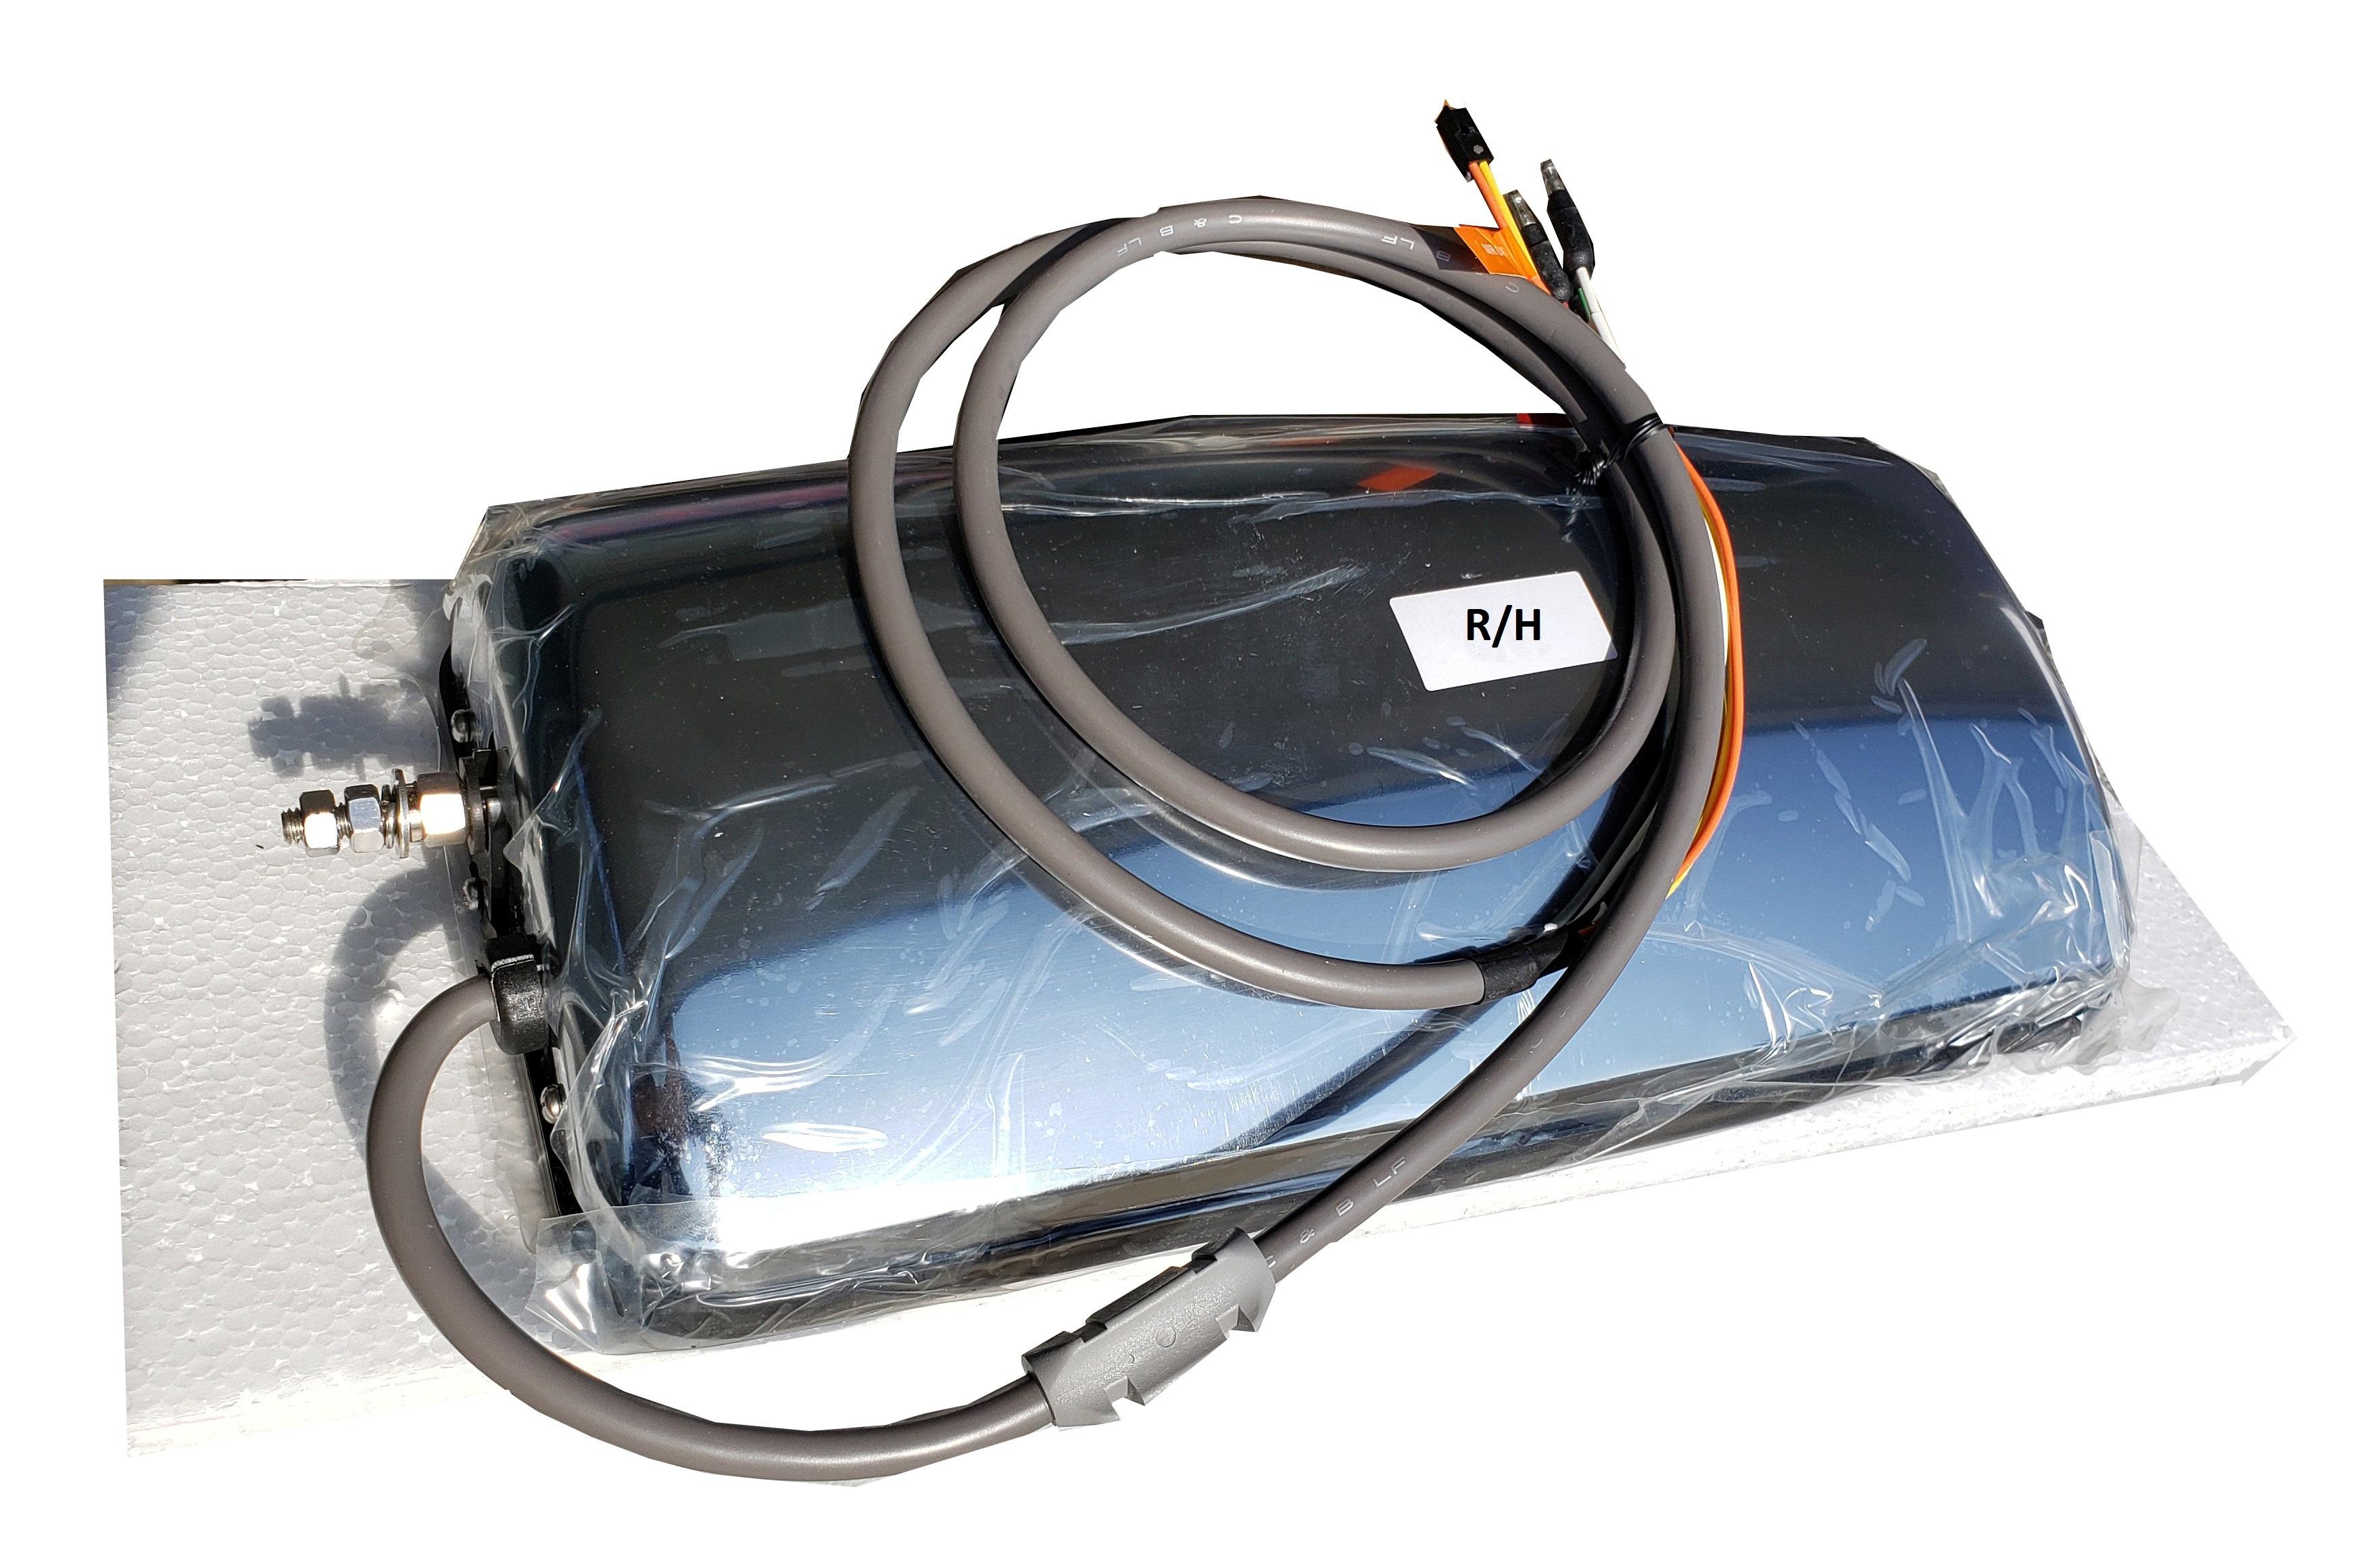 Peterbilt 389 Heated (R/H) West Coast Motor Mirror w/ Oat Sensor